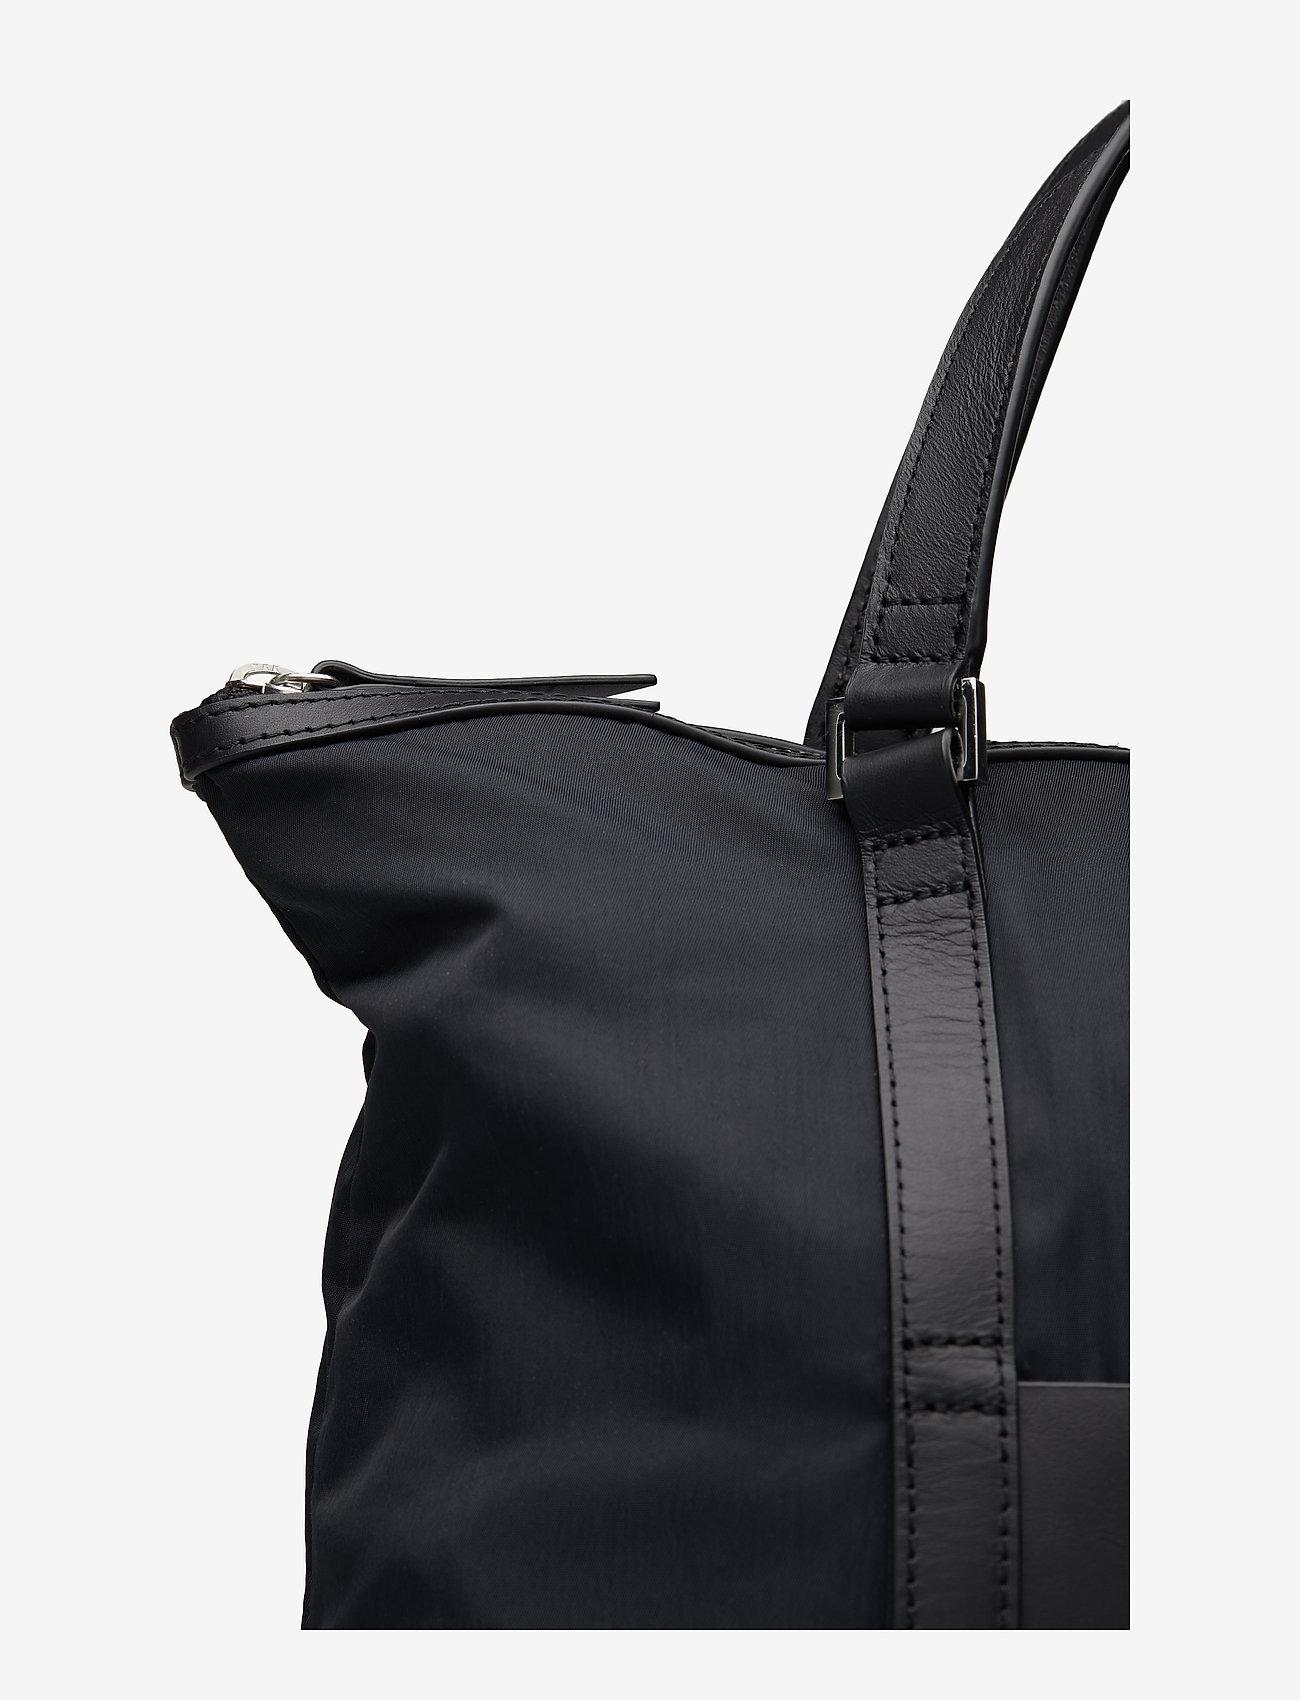 SANDQVIST - MARTA - nieuwe mode - black with black leather - 4